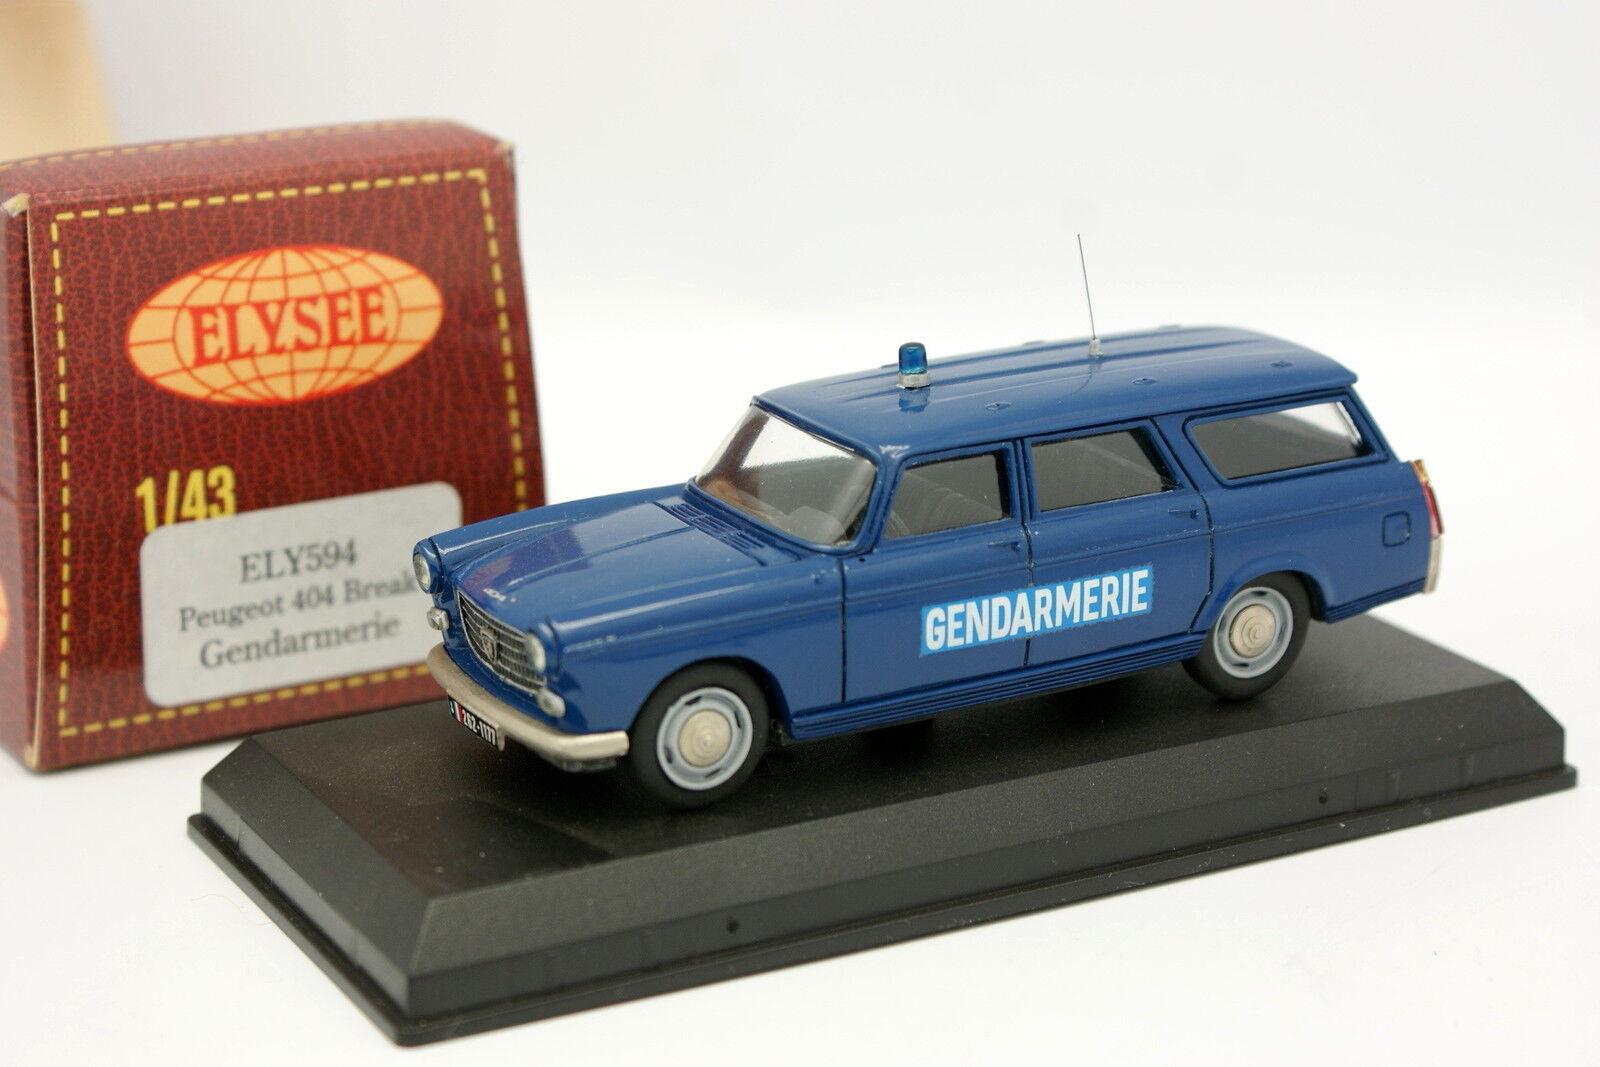 Elysée 1 43 - Peugeot 404 Break Gendarmerie